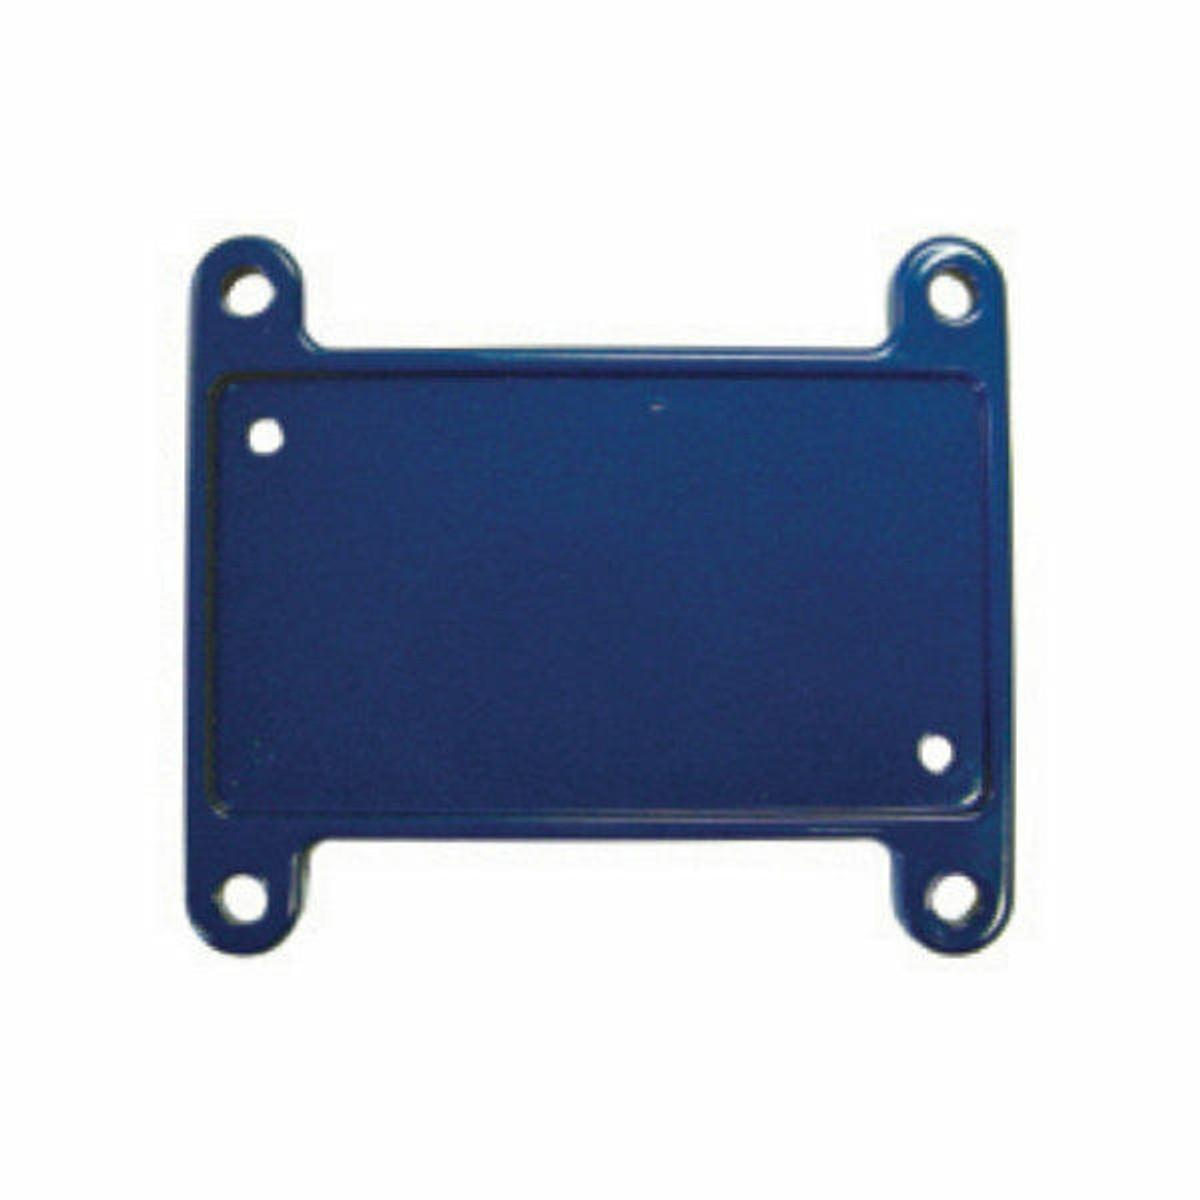 Wilson Electronics weBoost Wilson 901138 Mounting Plate for DataPro Amplifier